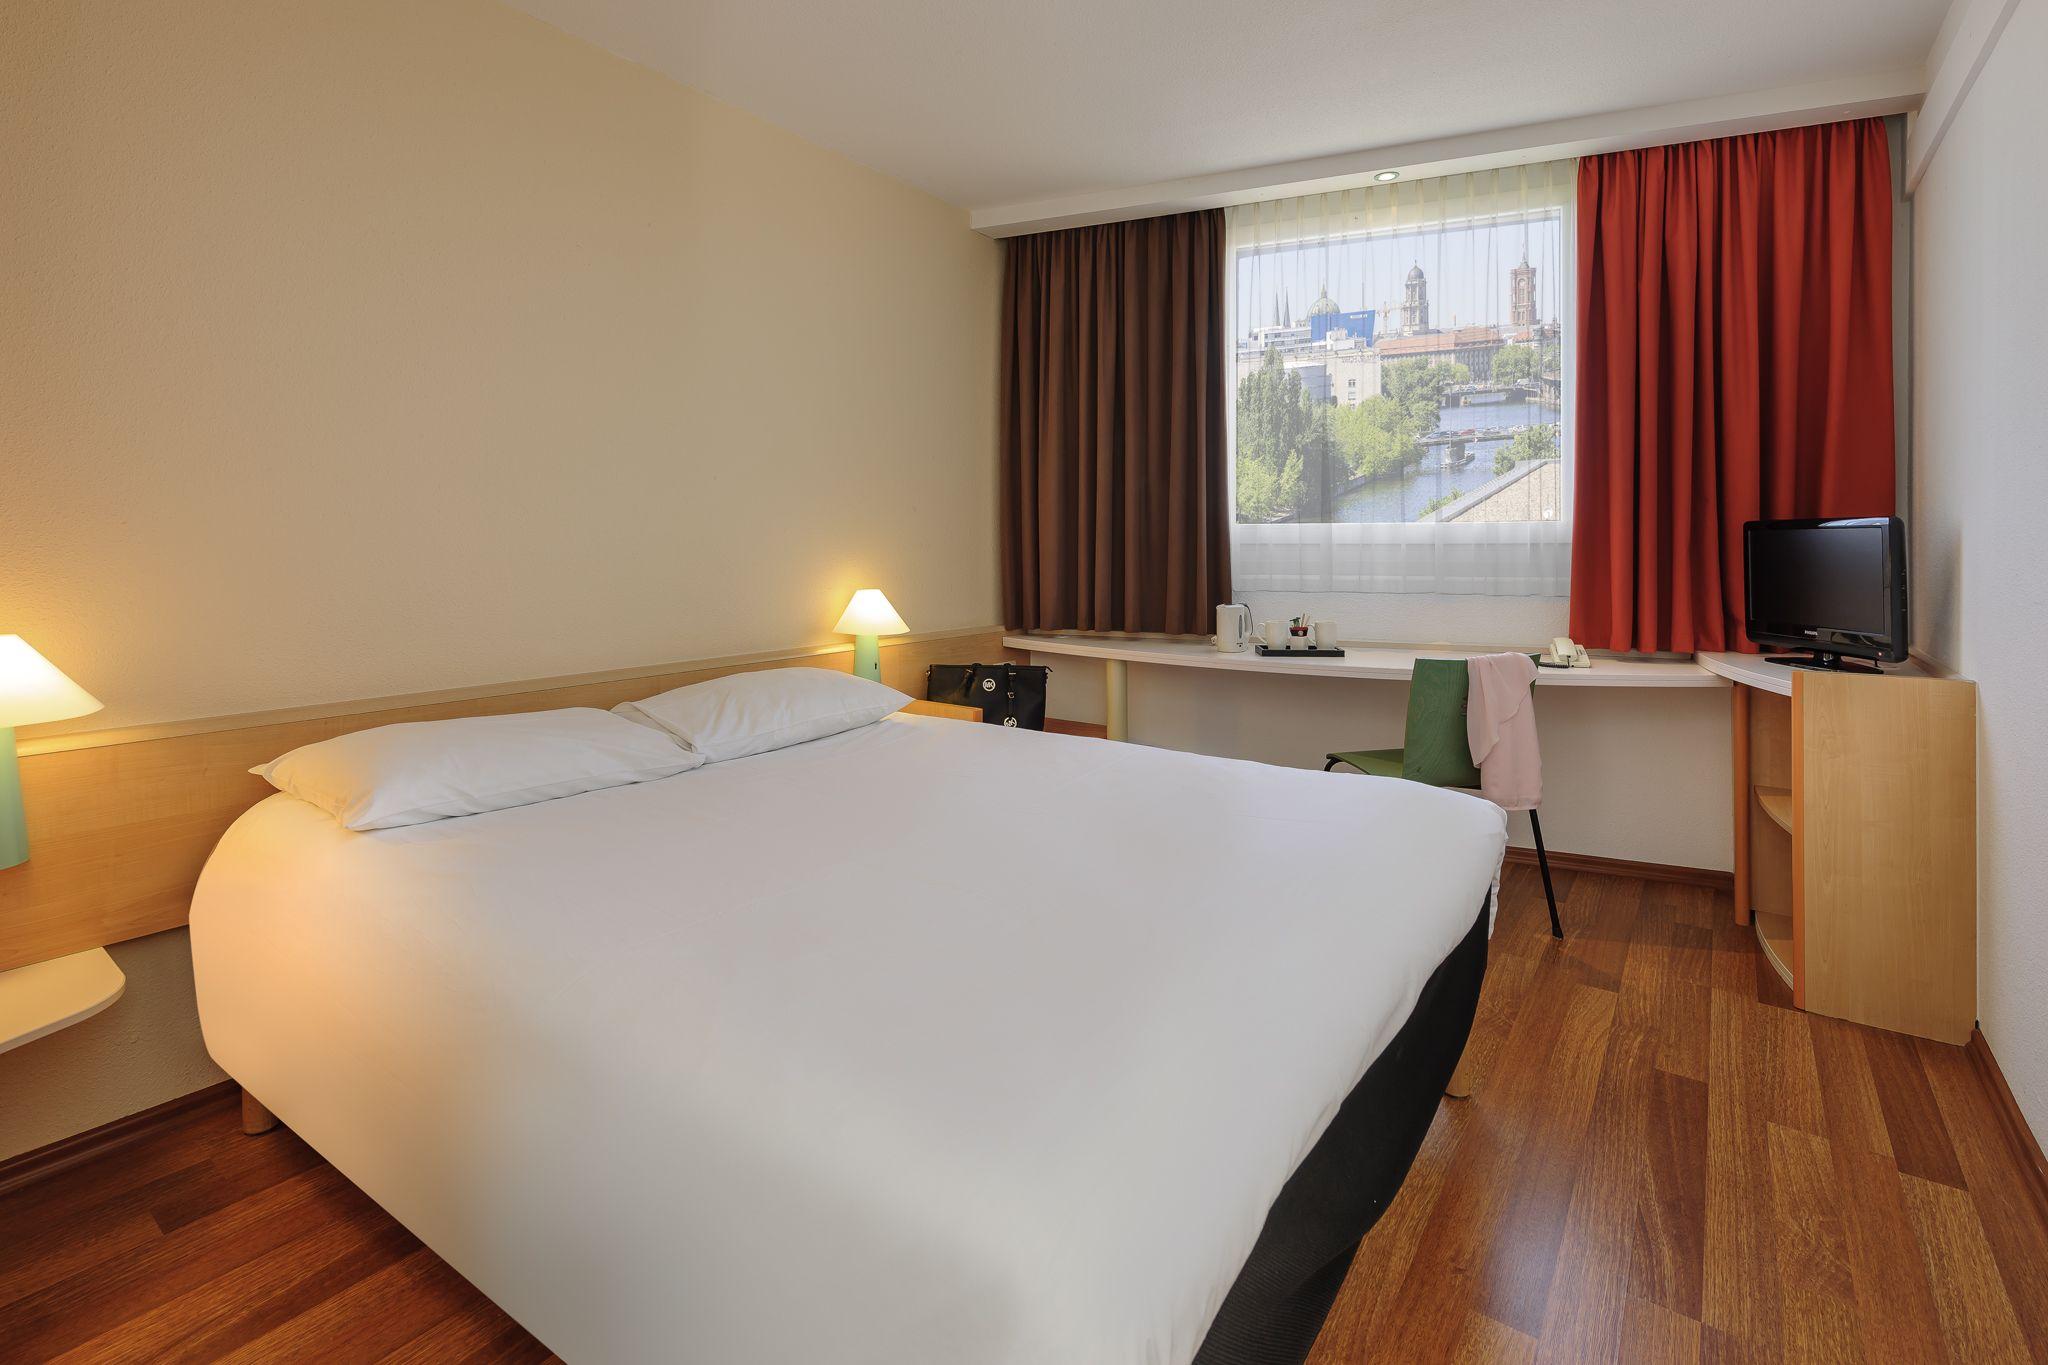 Berlin Hotel Ohne Personal